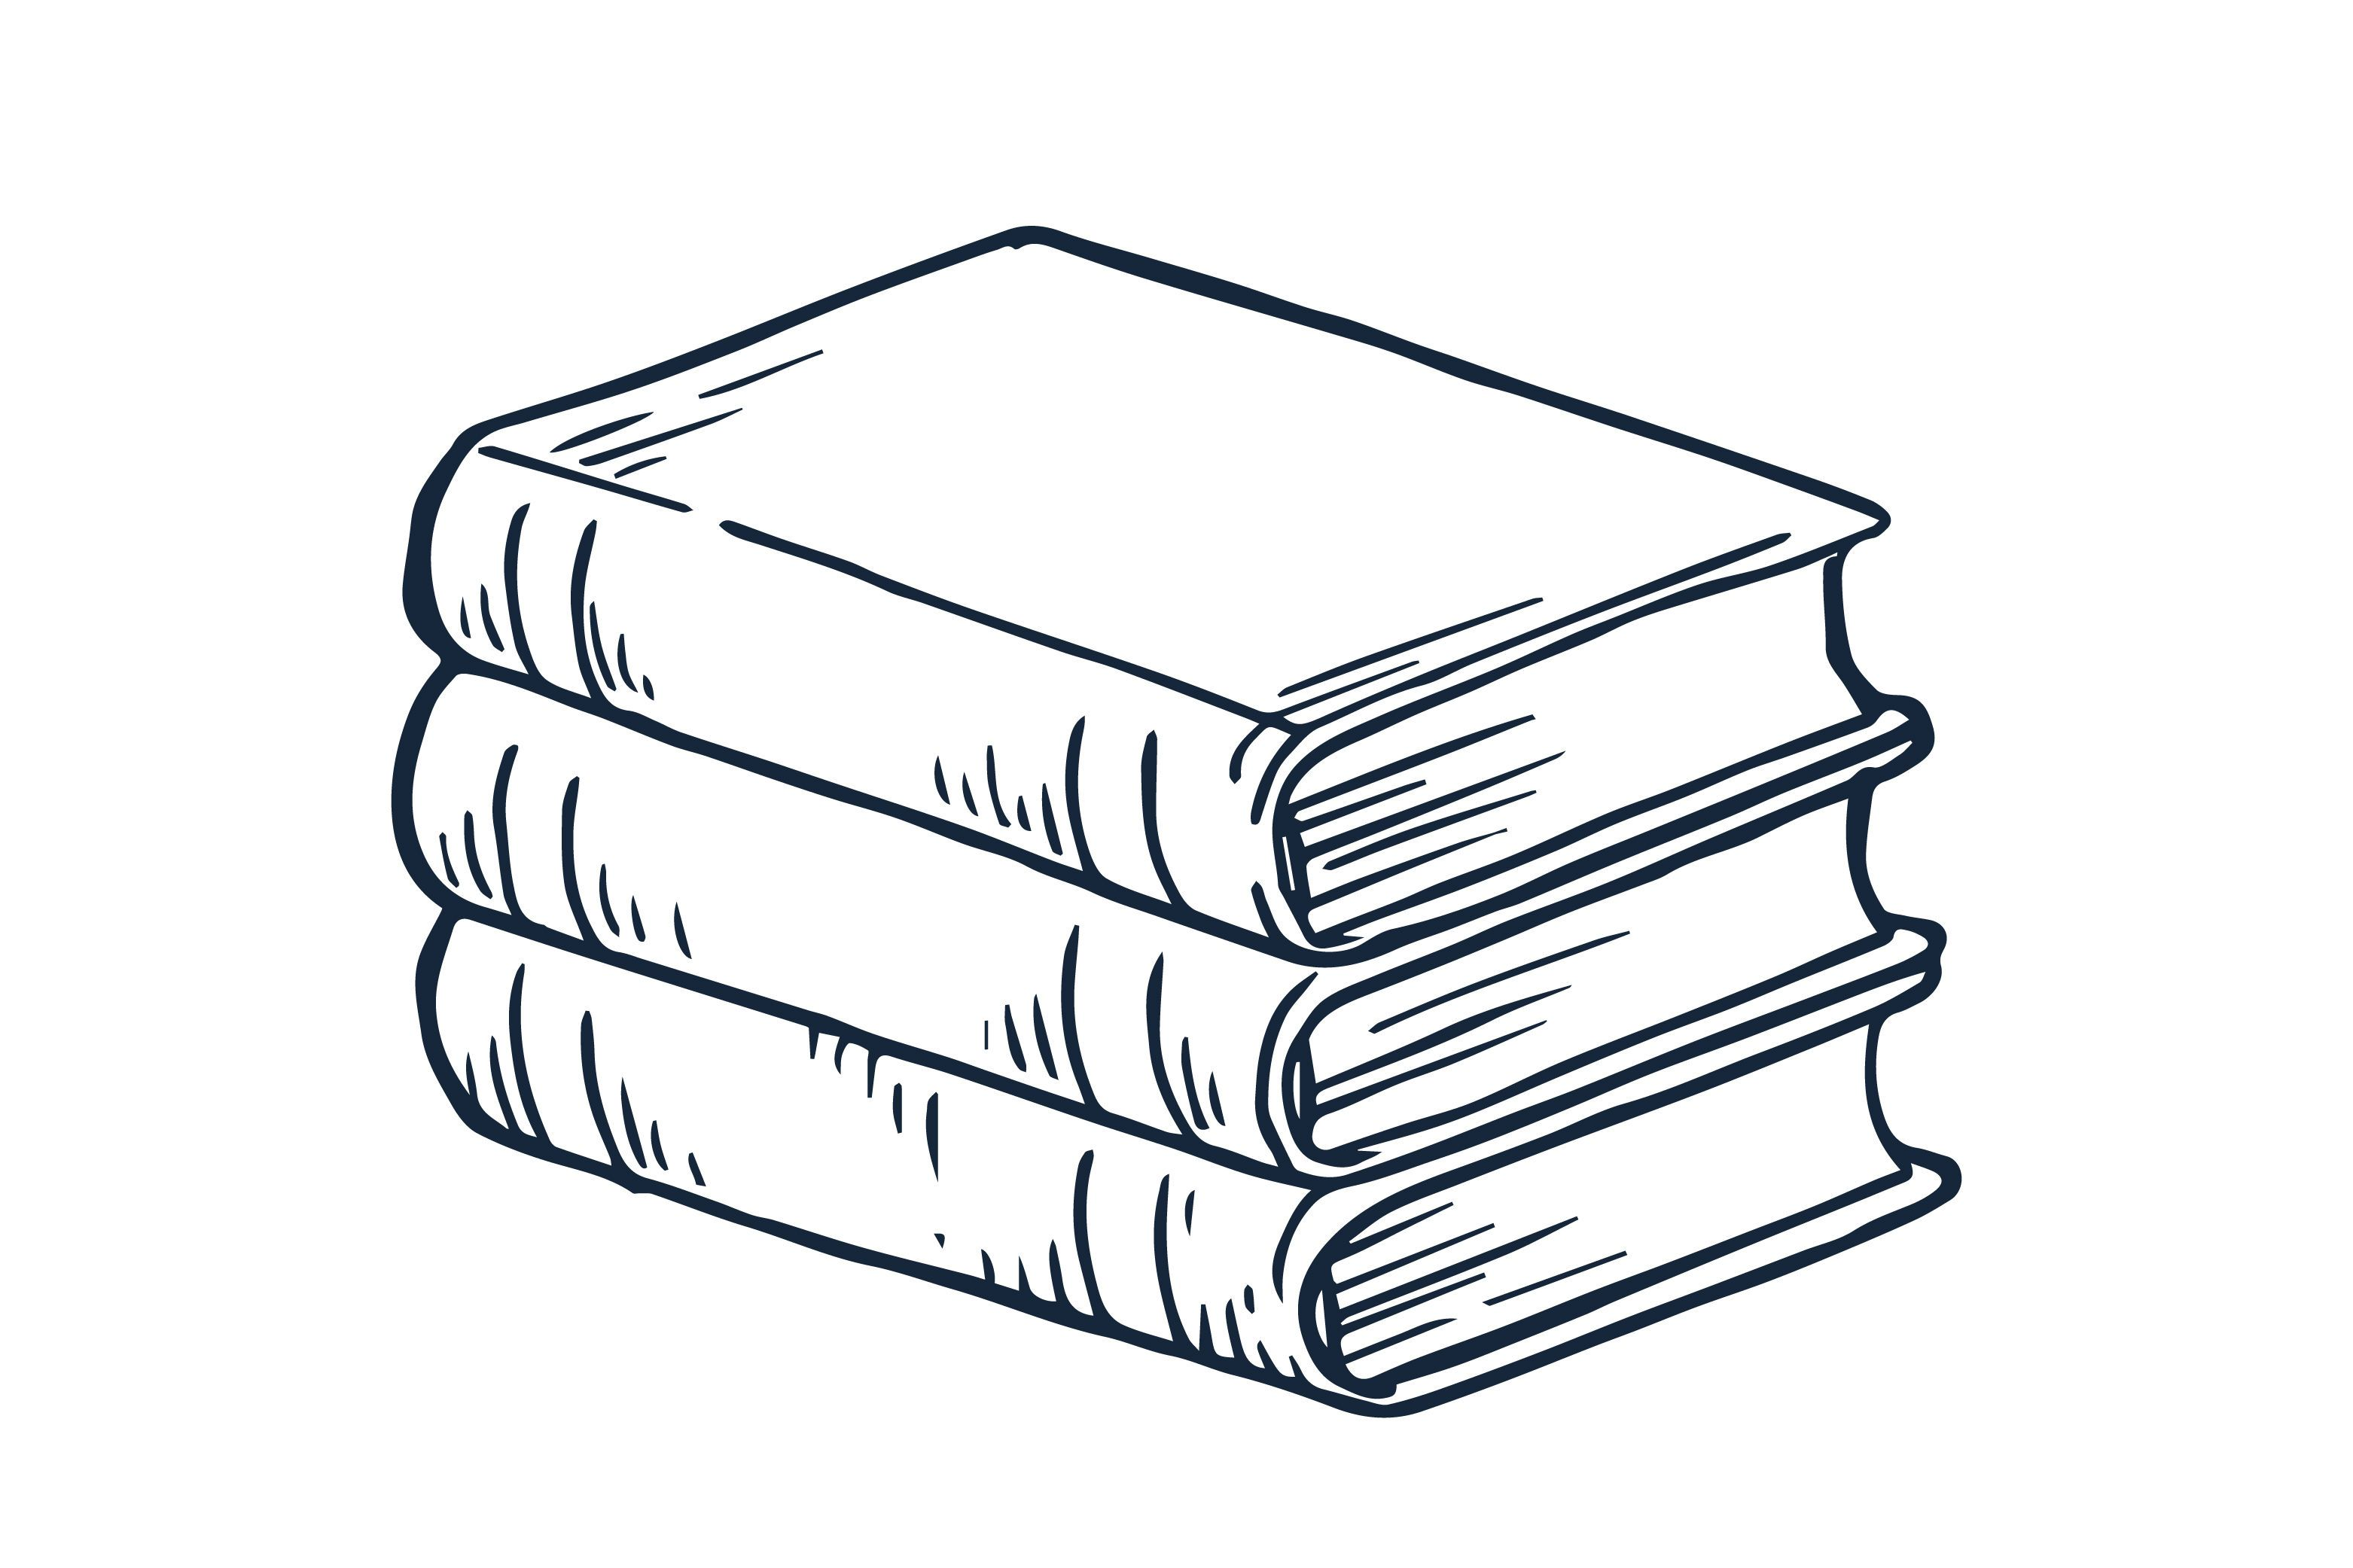 Line art stack of books illustration